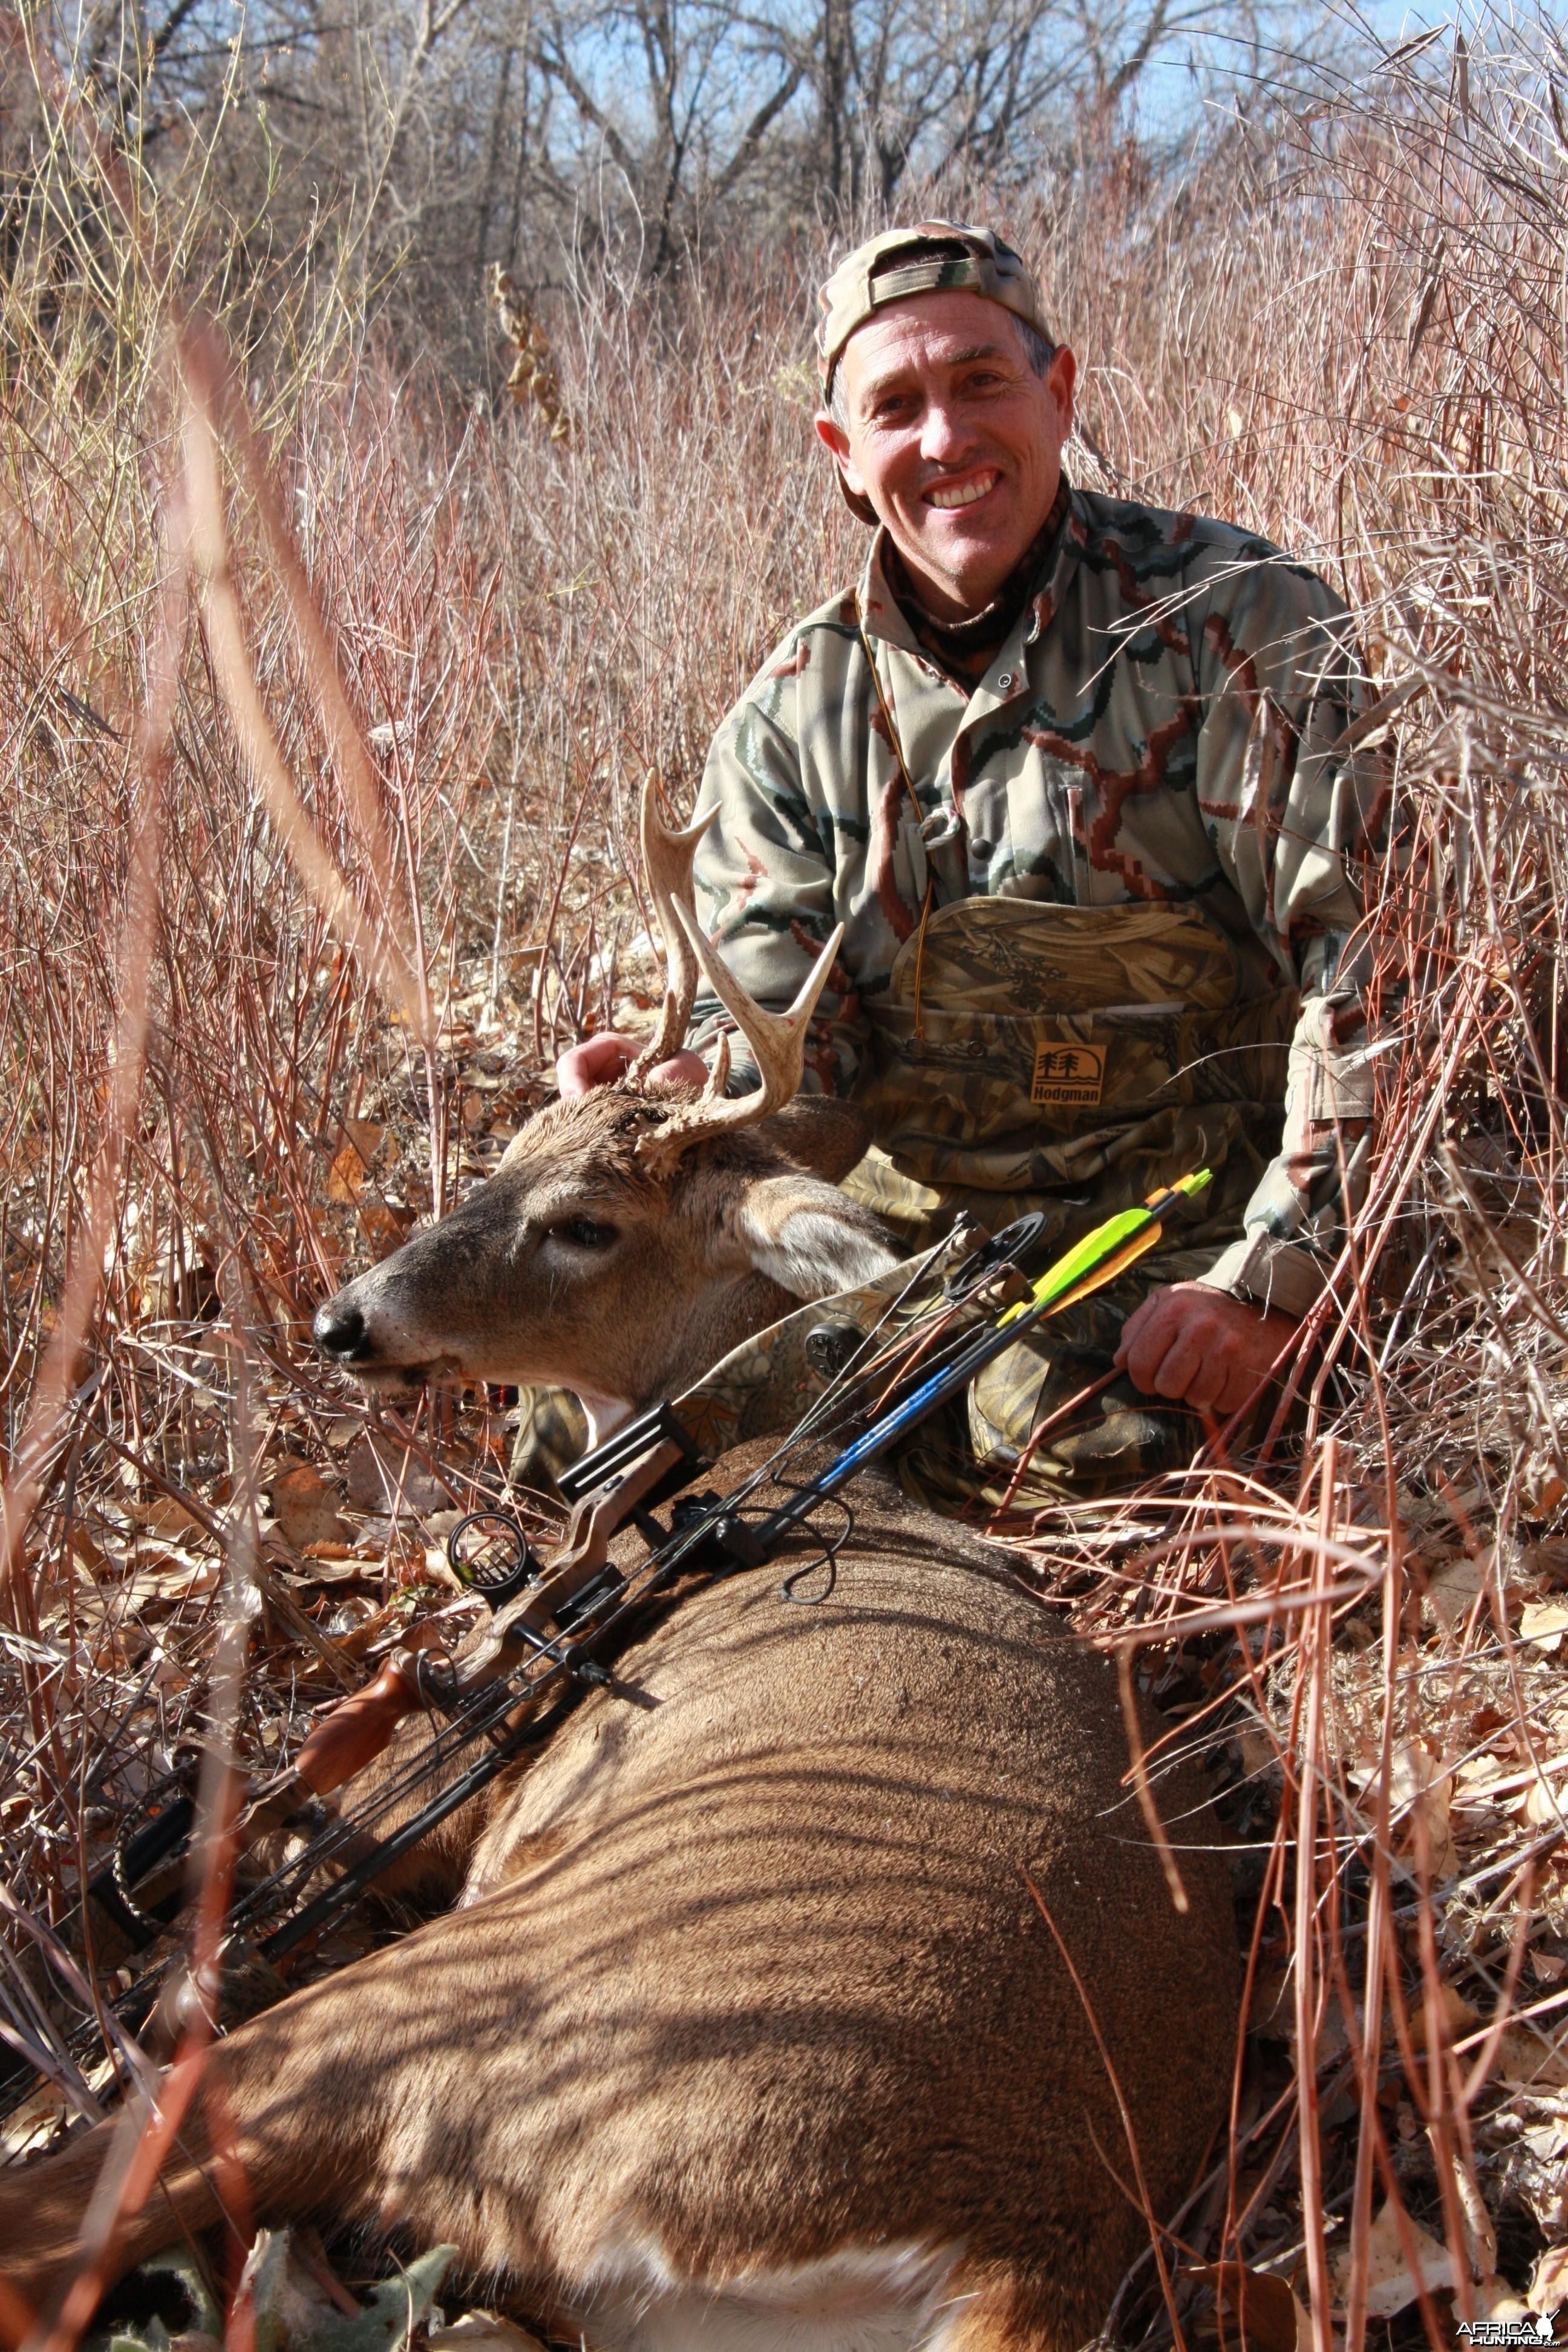 A rare Colorado frontrange White-tailed deer